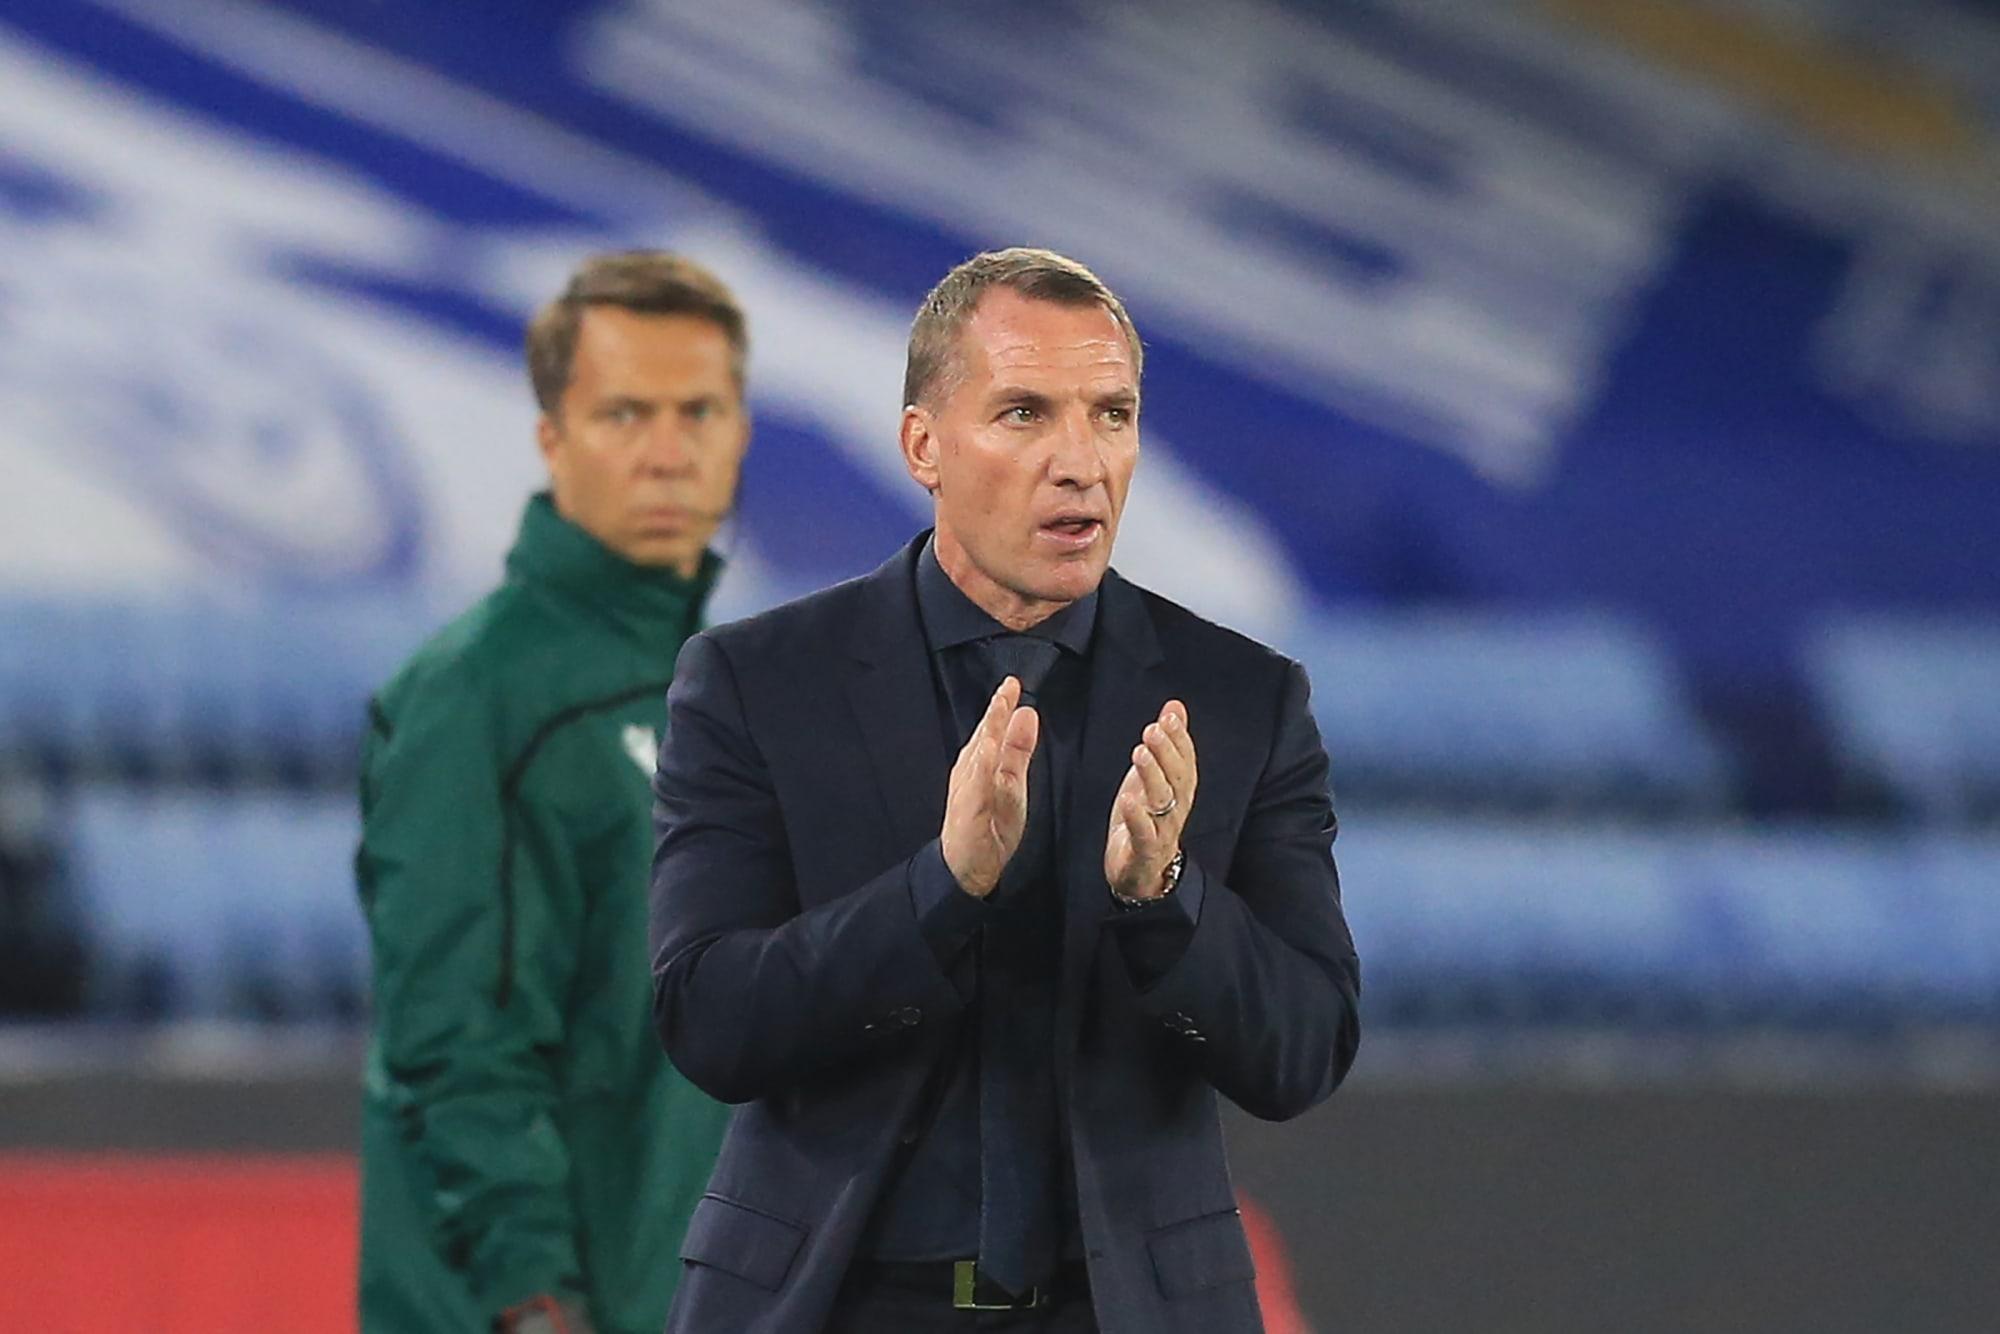 Leicester: Brendan Rodgers provides injury update on Jamie Vardy